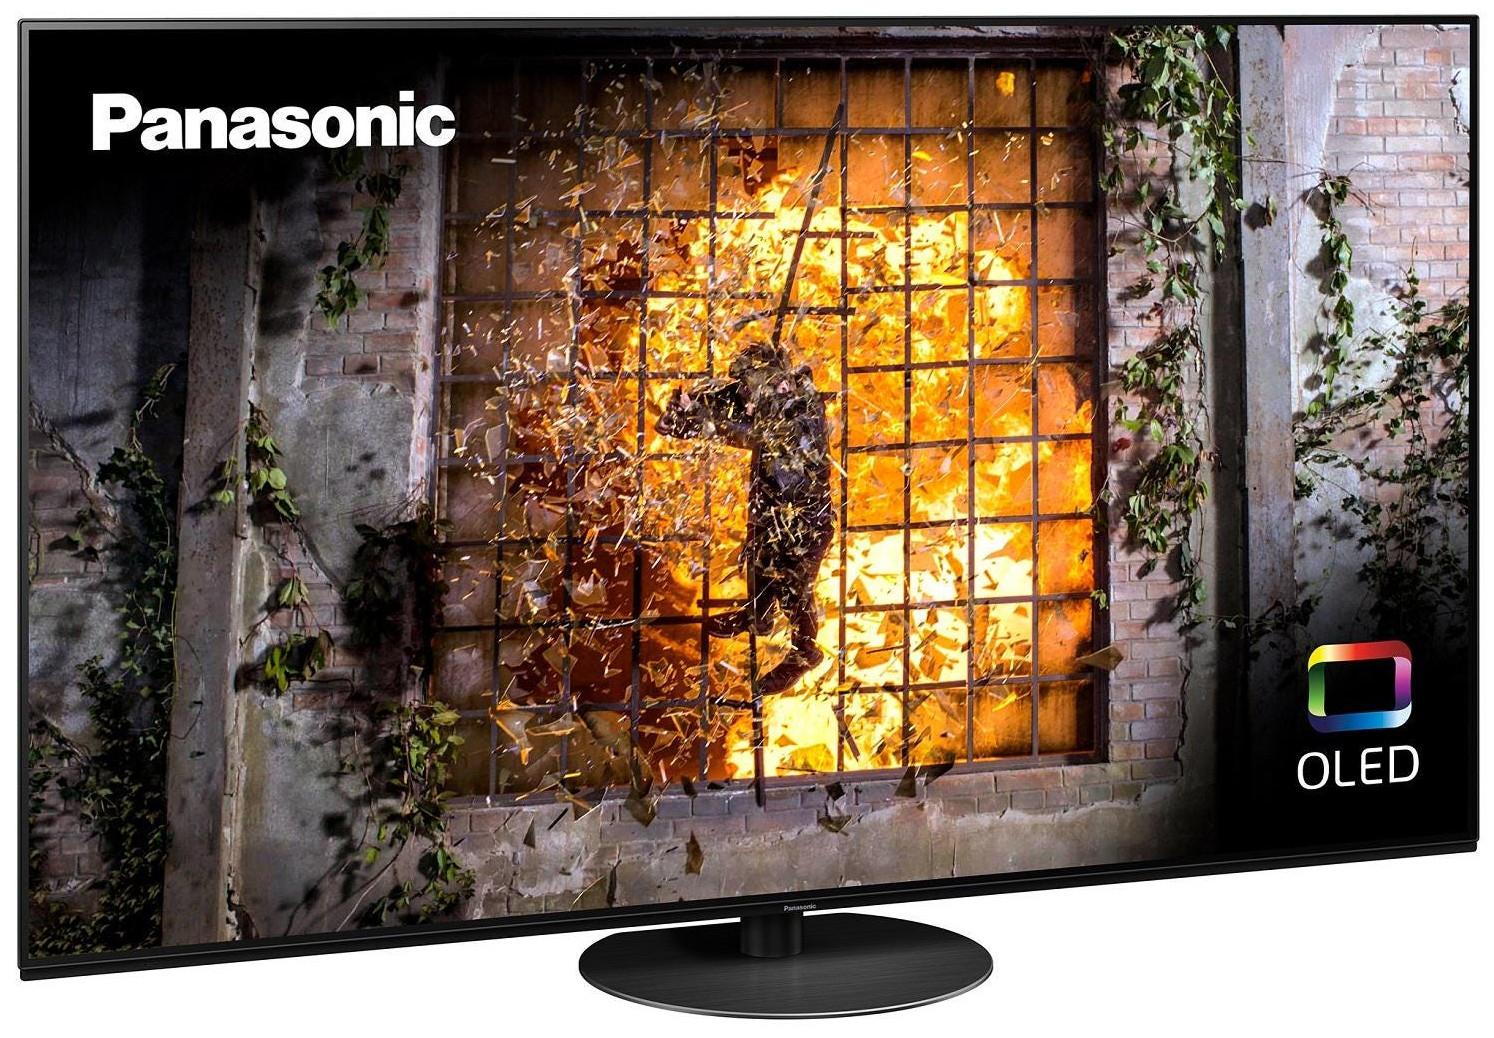 "Panasonic TX-55HZ1000B (2020) OLED HDR 4K Ultra HD Smart TV, 55"" w/ Freeview Play Dolby Atmos - £1299 @ John Lewis & Partners"